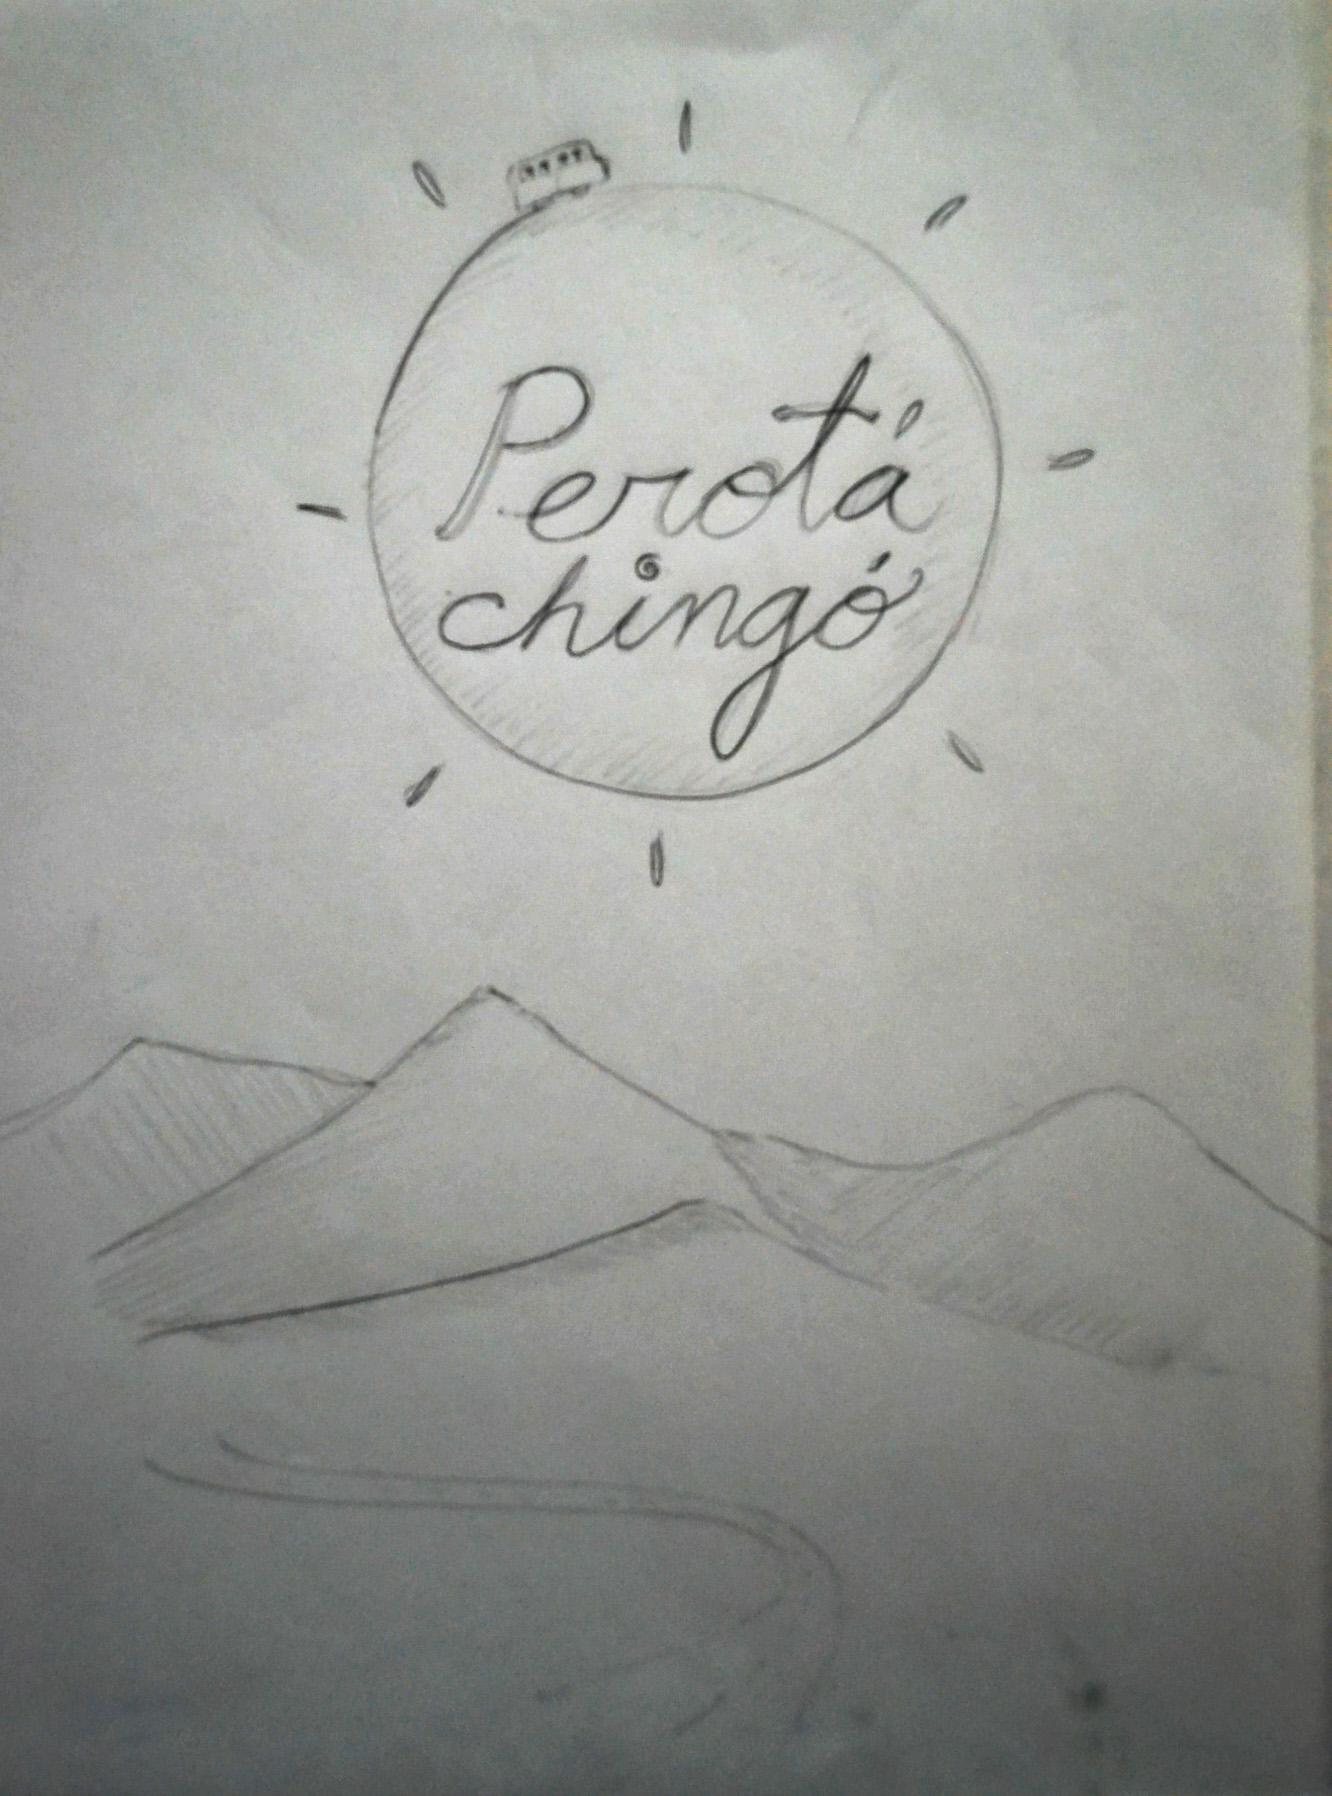 Perotá Chingo - image 7 - student project